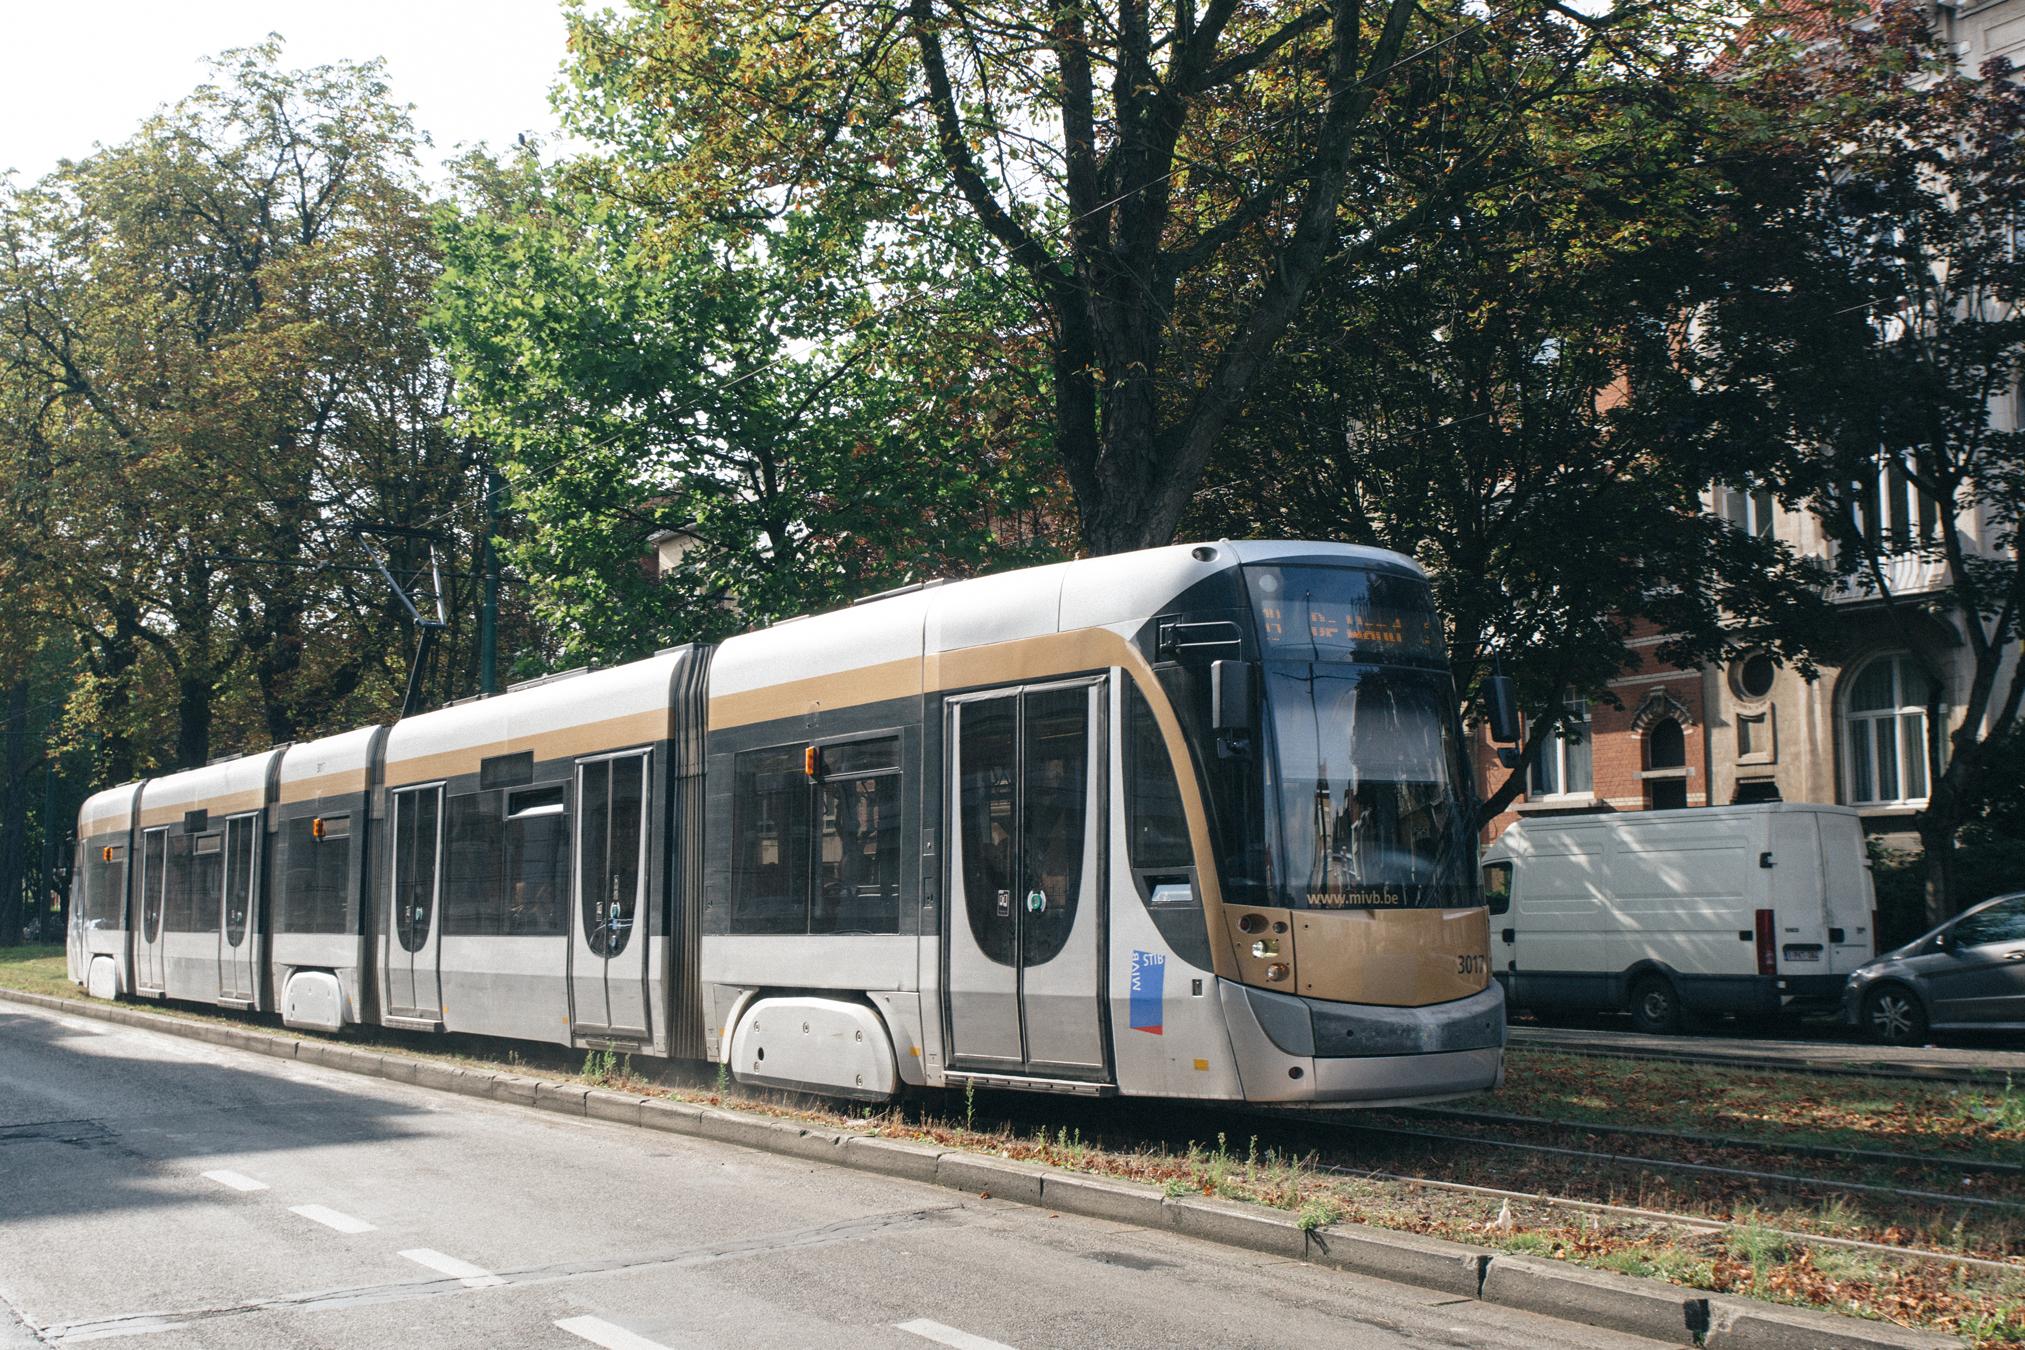 Bruxelas-23.jpg